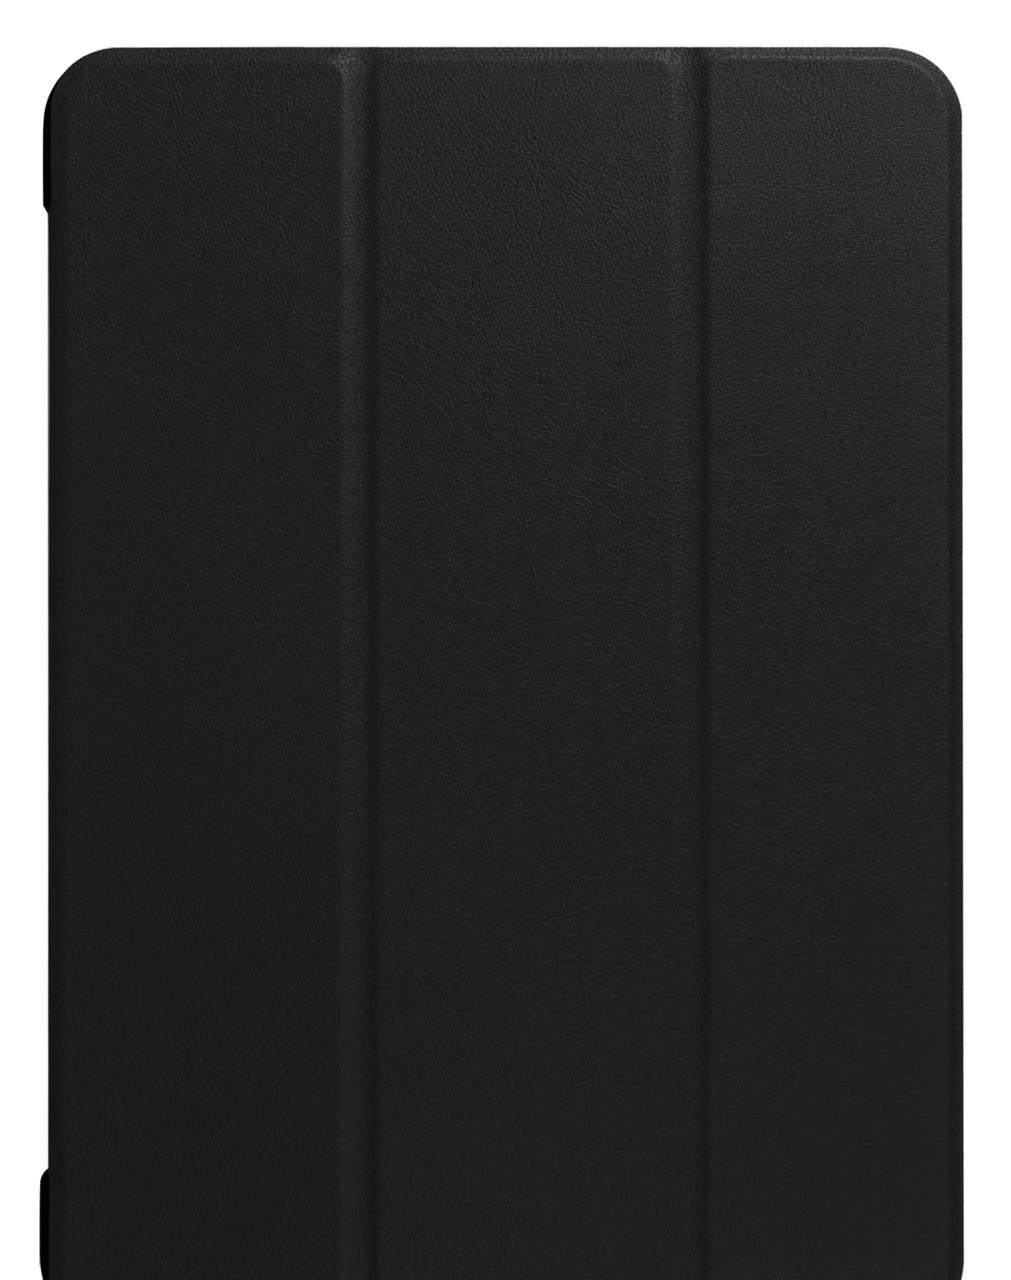 Чехол для планшета AIRON Premium для Apple iPad A1822 (2017) 9.7 (4822356710569)